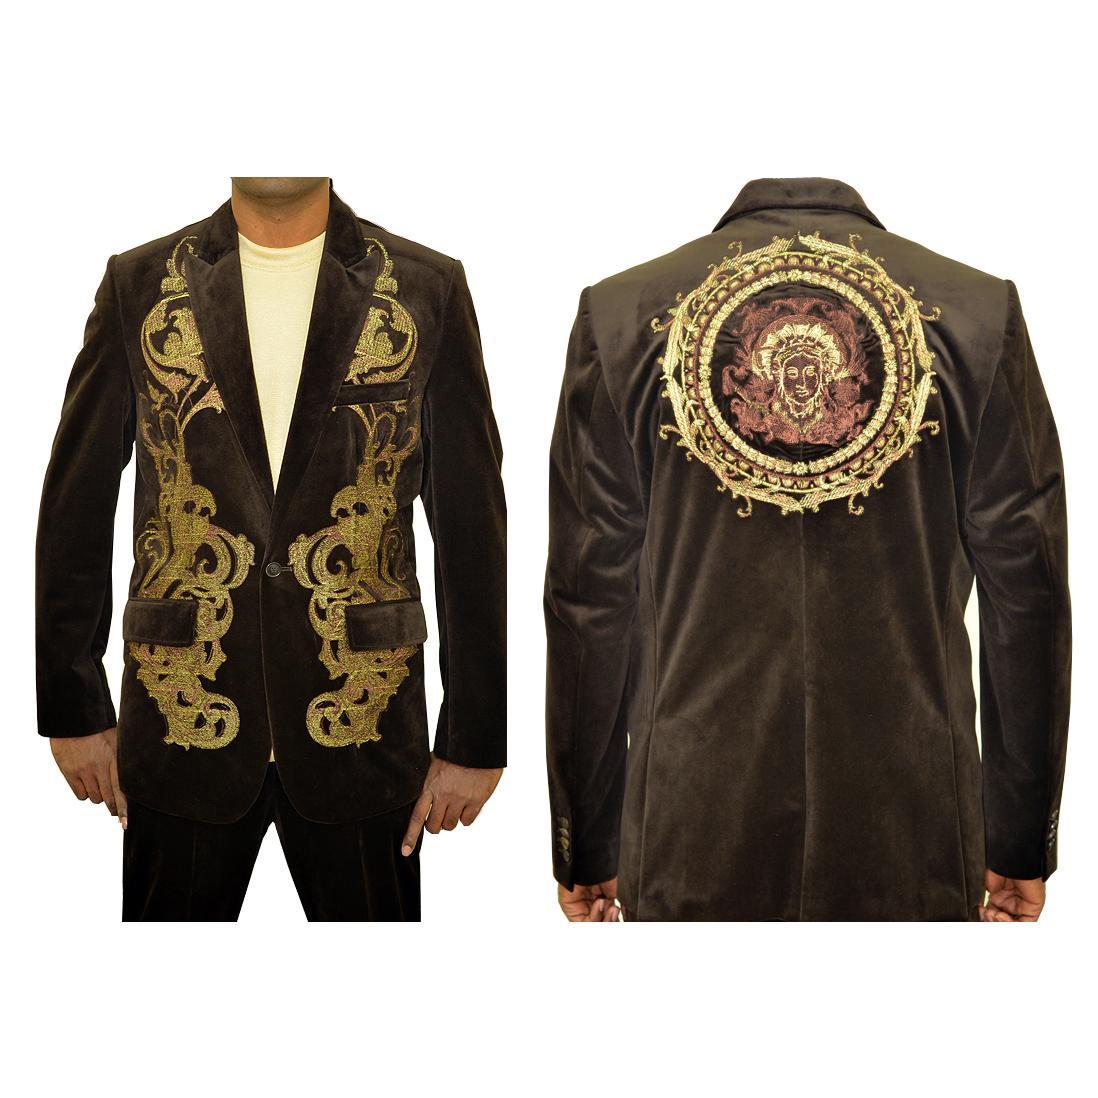 Prestige Dark Brown Velvet With Gold Embroidery Design Casual Suit Blz 425 289 90 Upscale Menswear Upscalemenswear Com